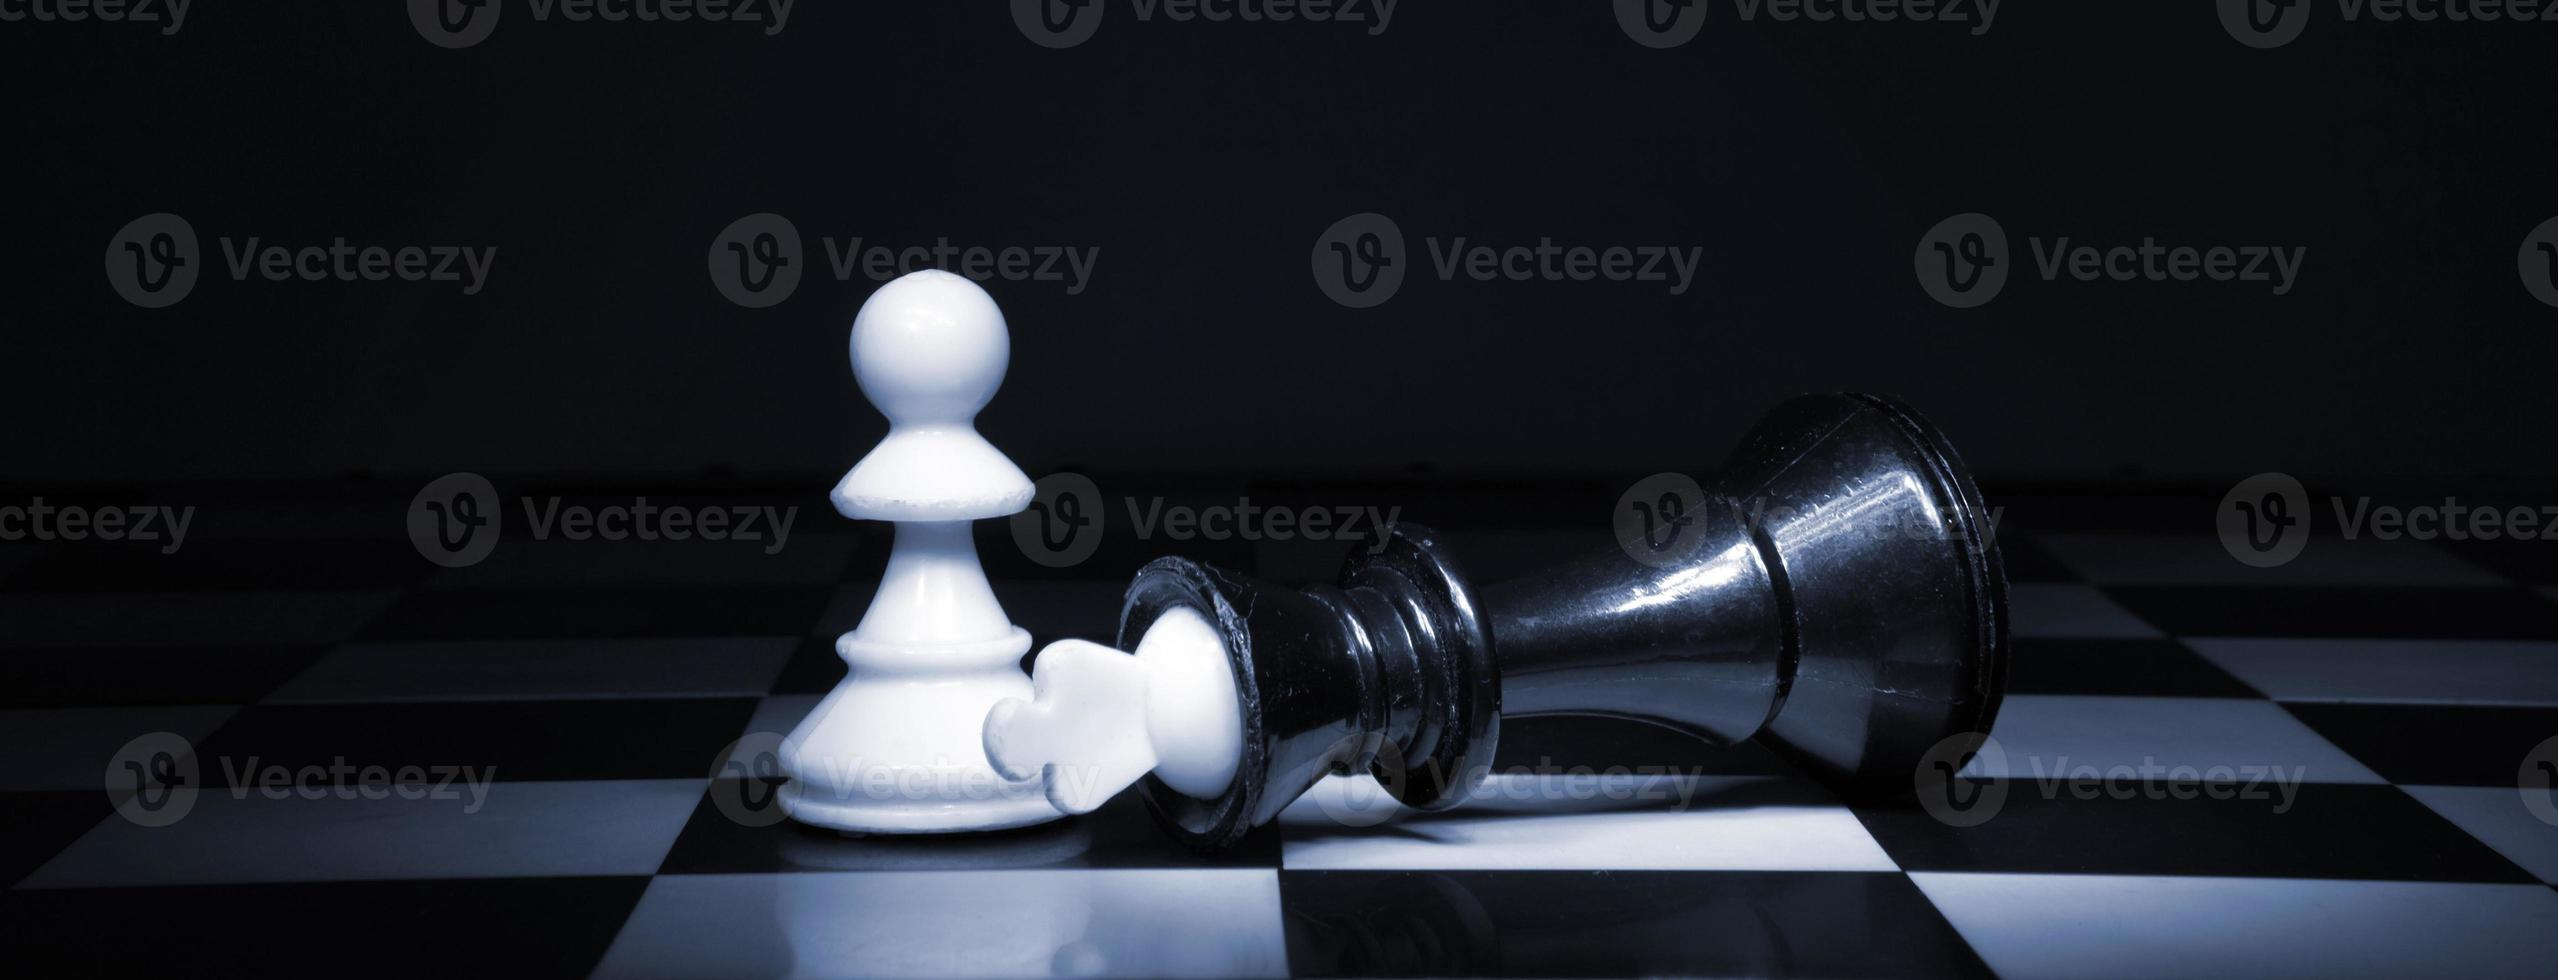 The chess photo